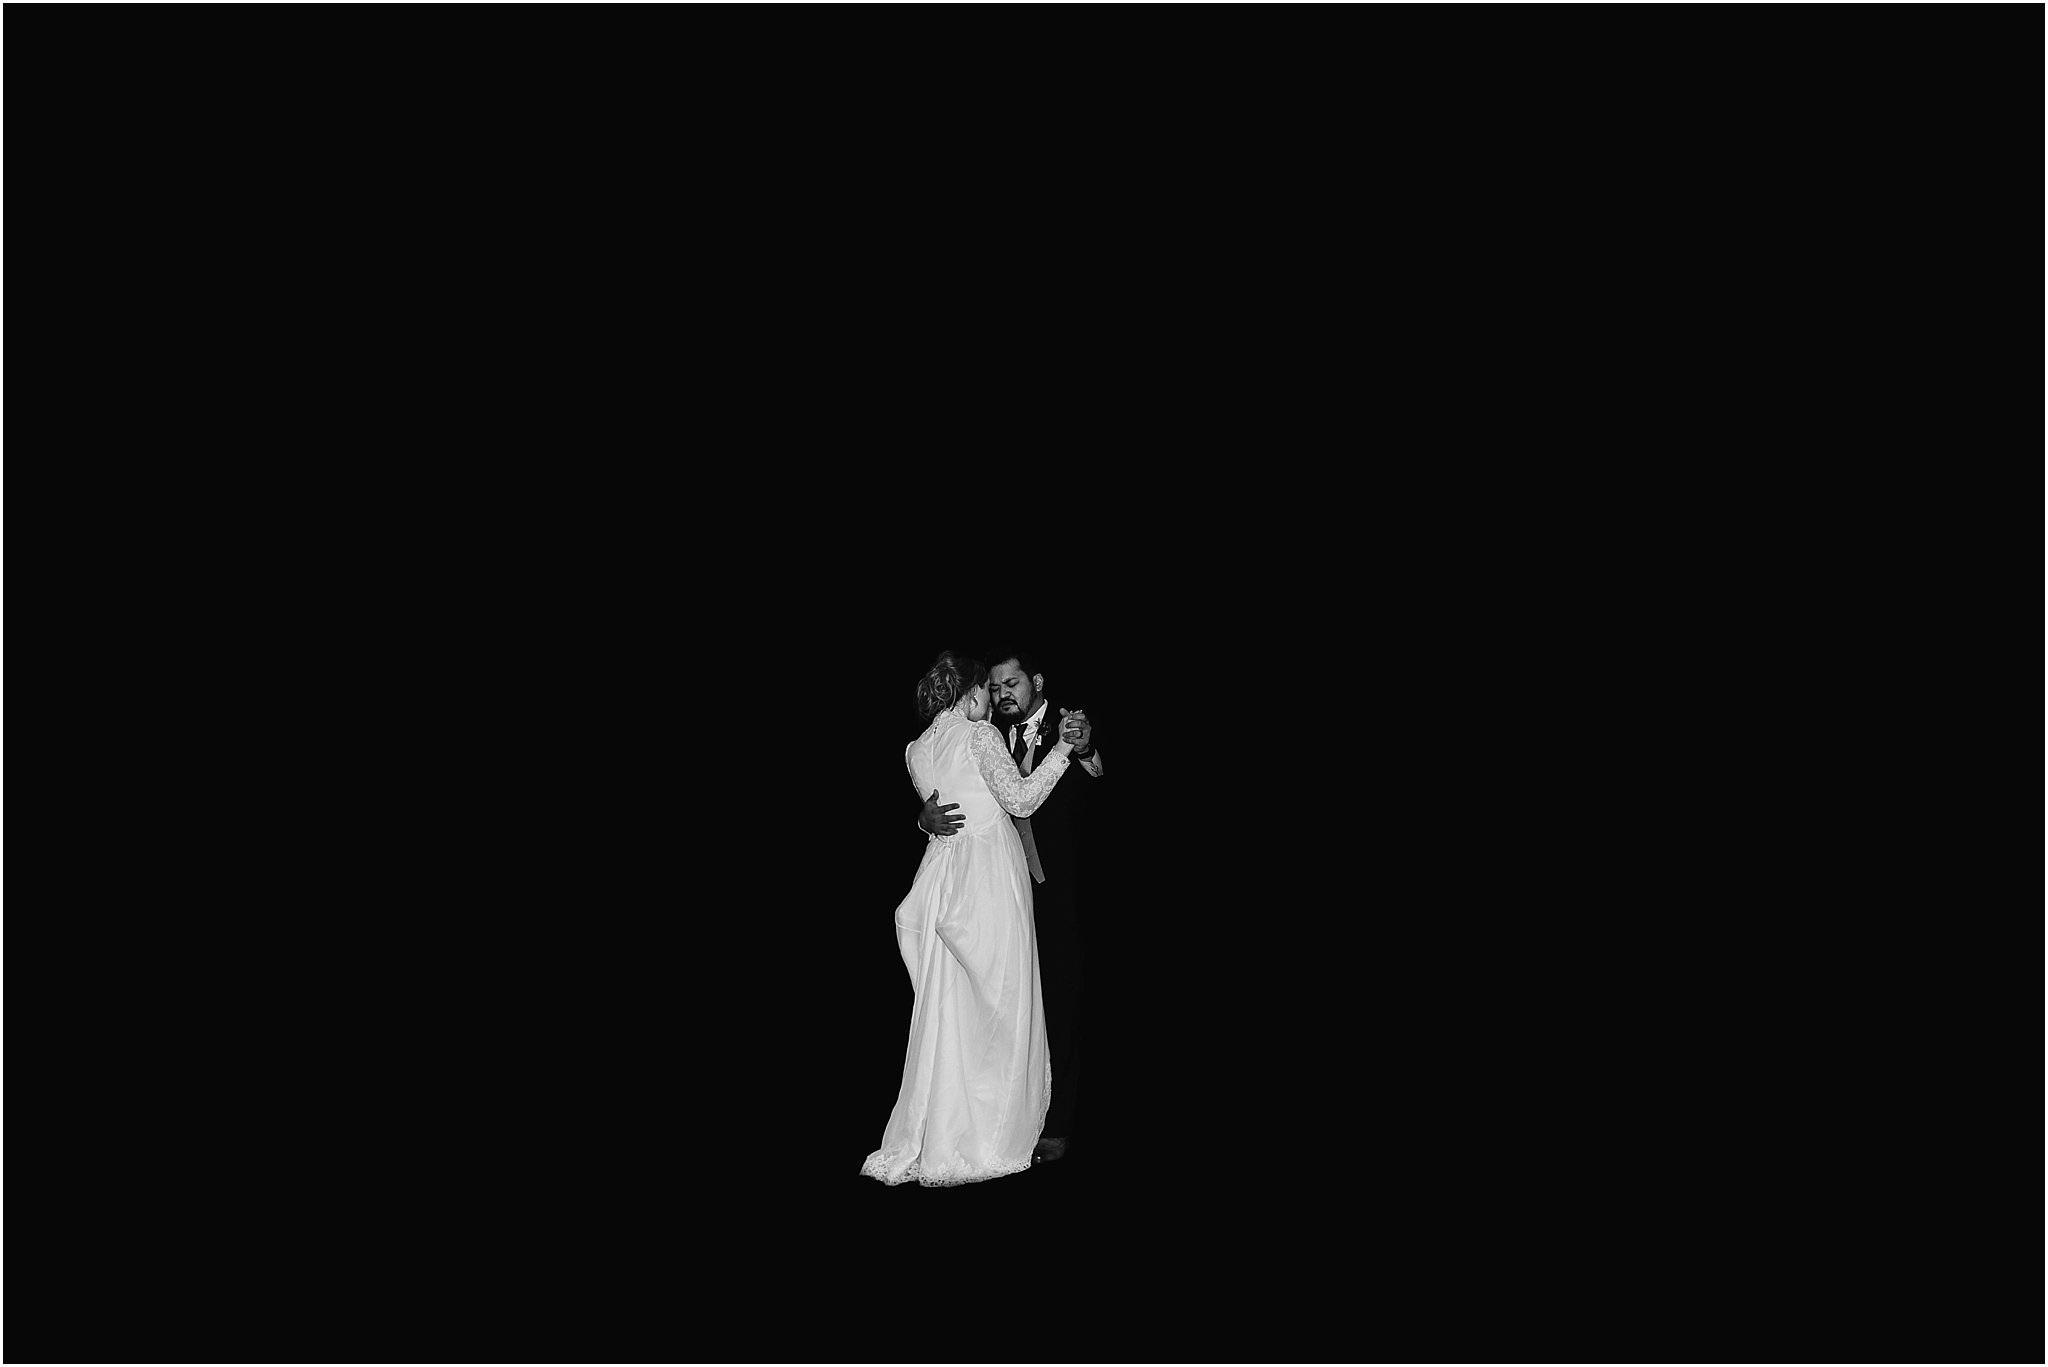 katy-robin-married-in-mukilteo-wedding39.jpg